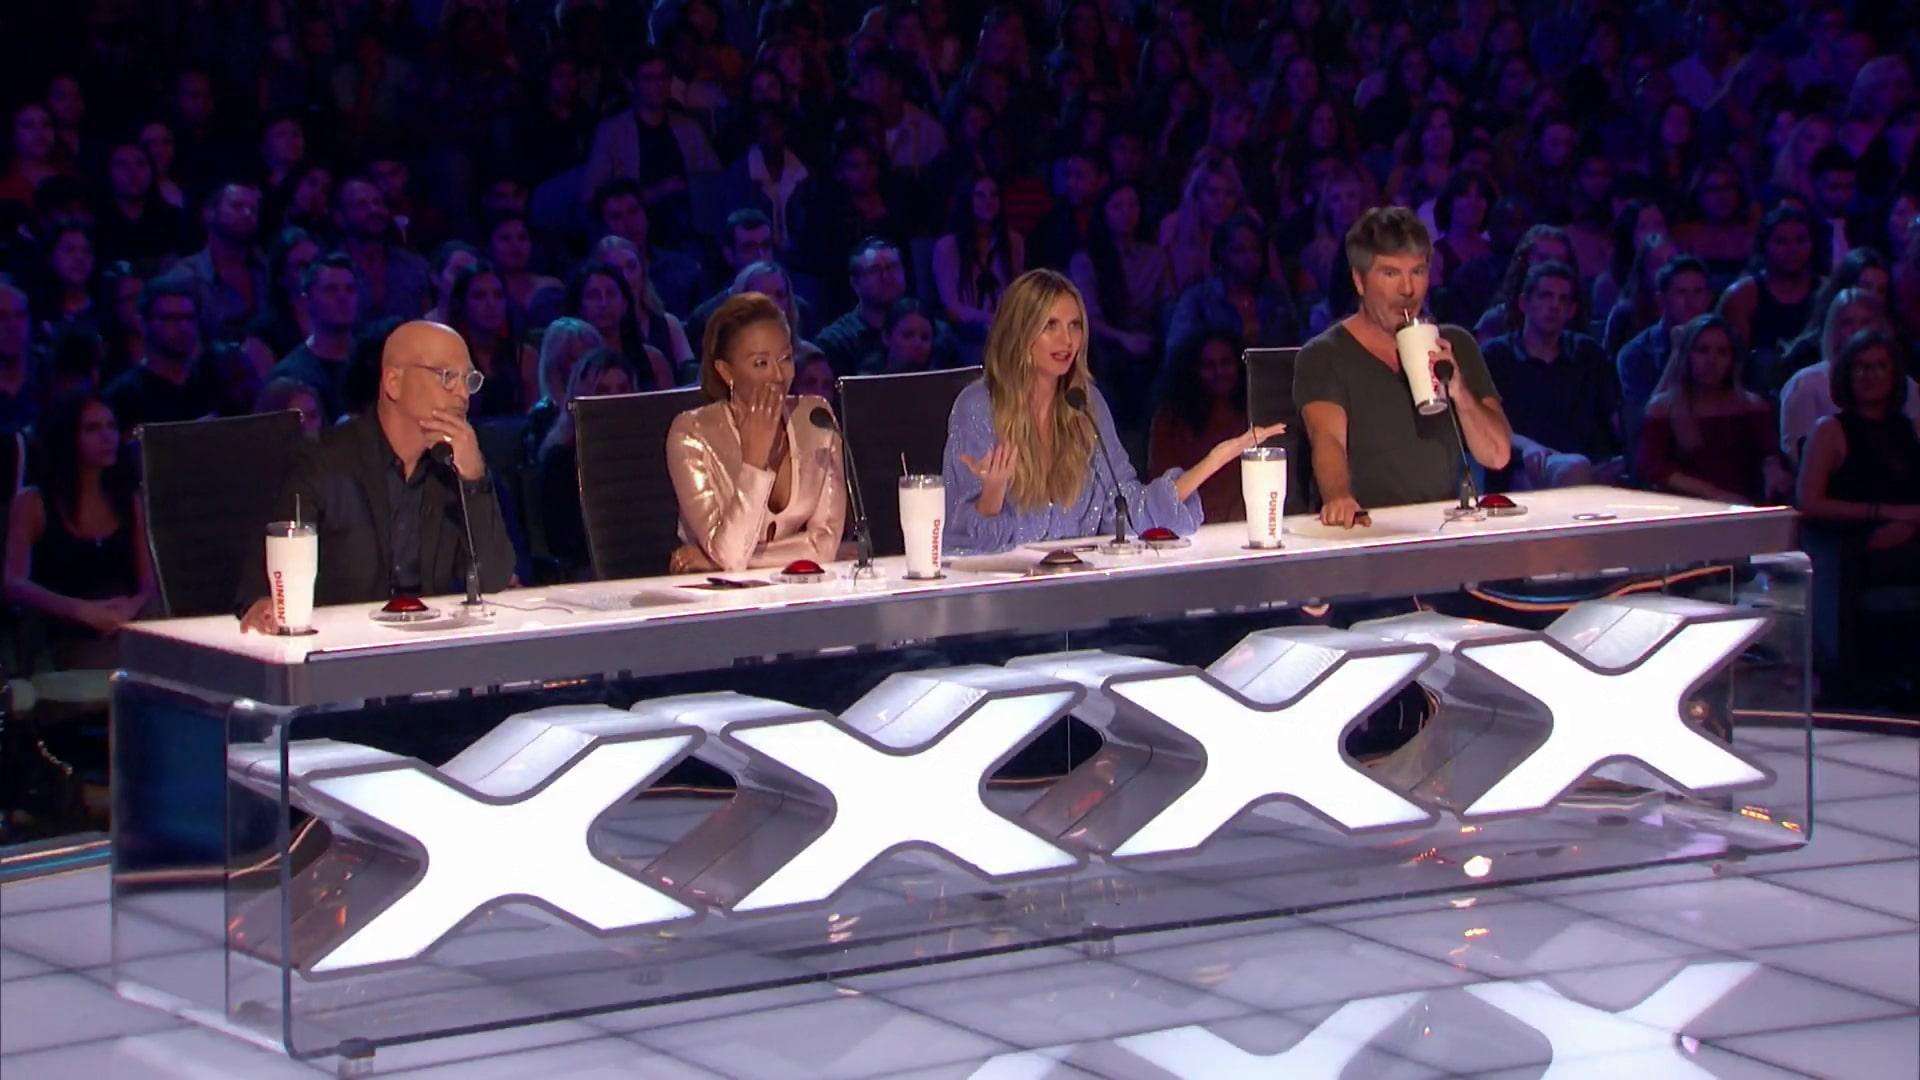 America's Got Talent - Season 14 - Watch Online Movies & TV